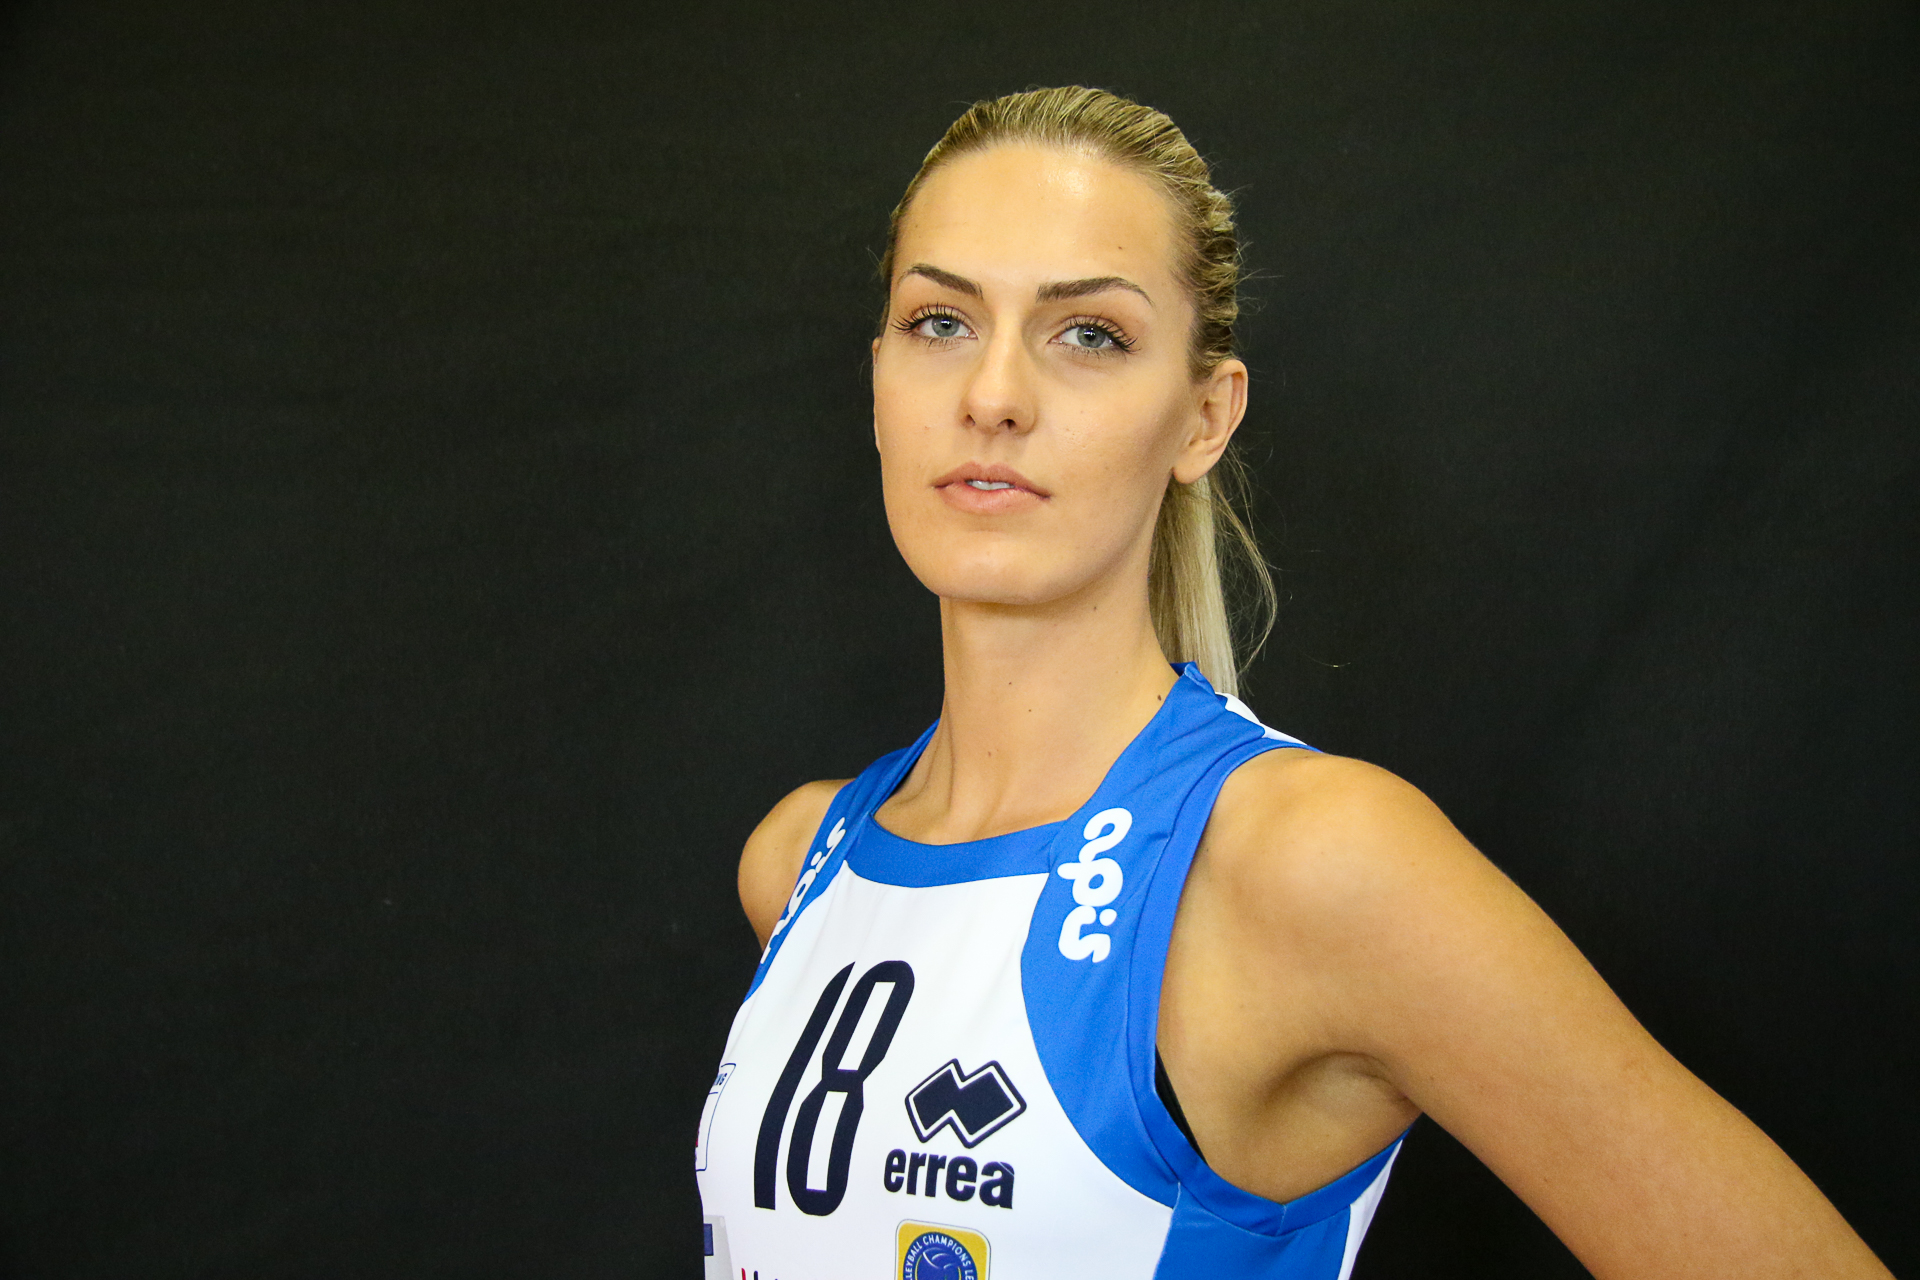 Tamara Susic